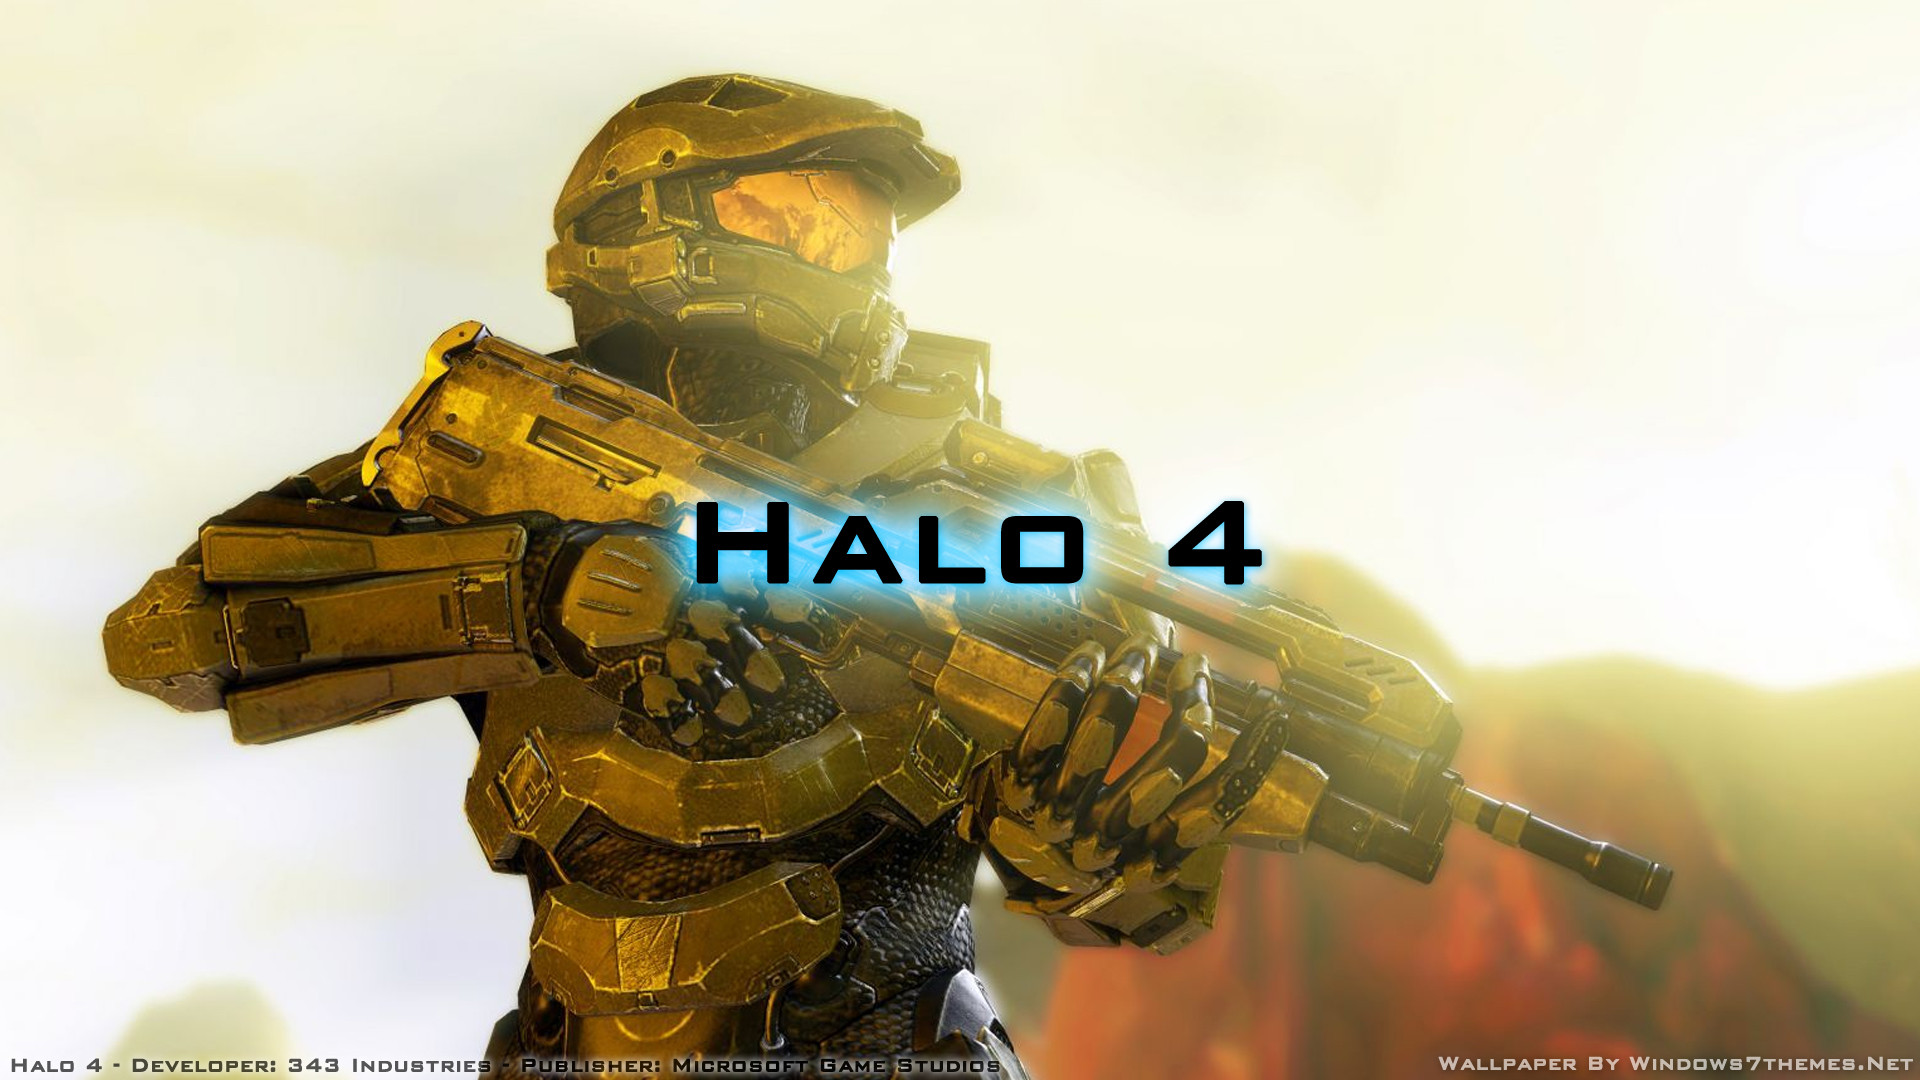 Download Halo 4 Wallpaper 1